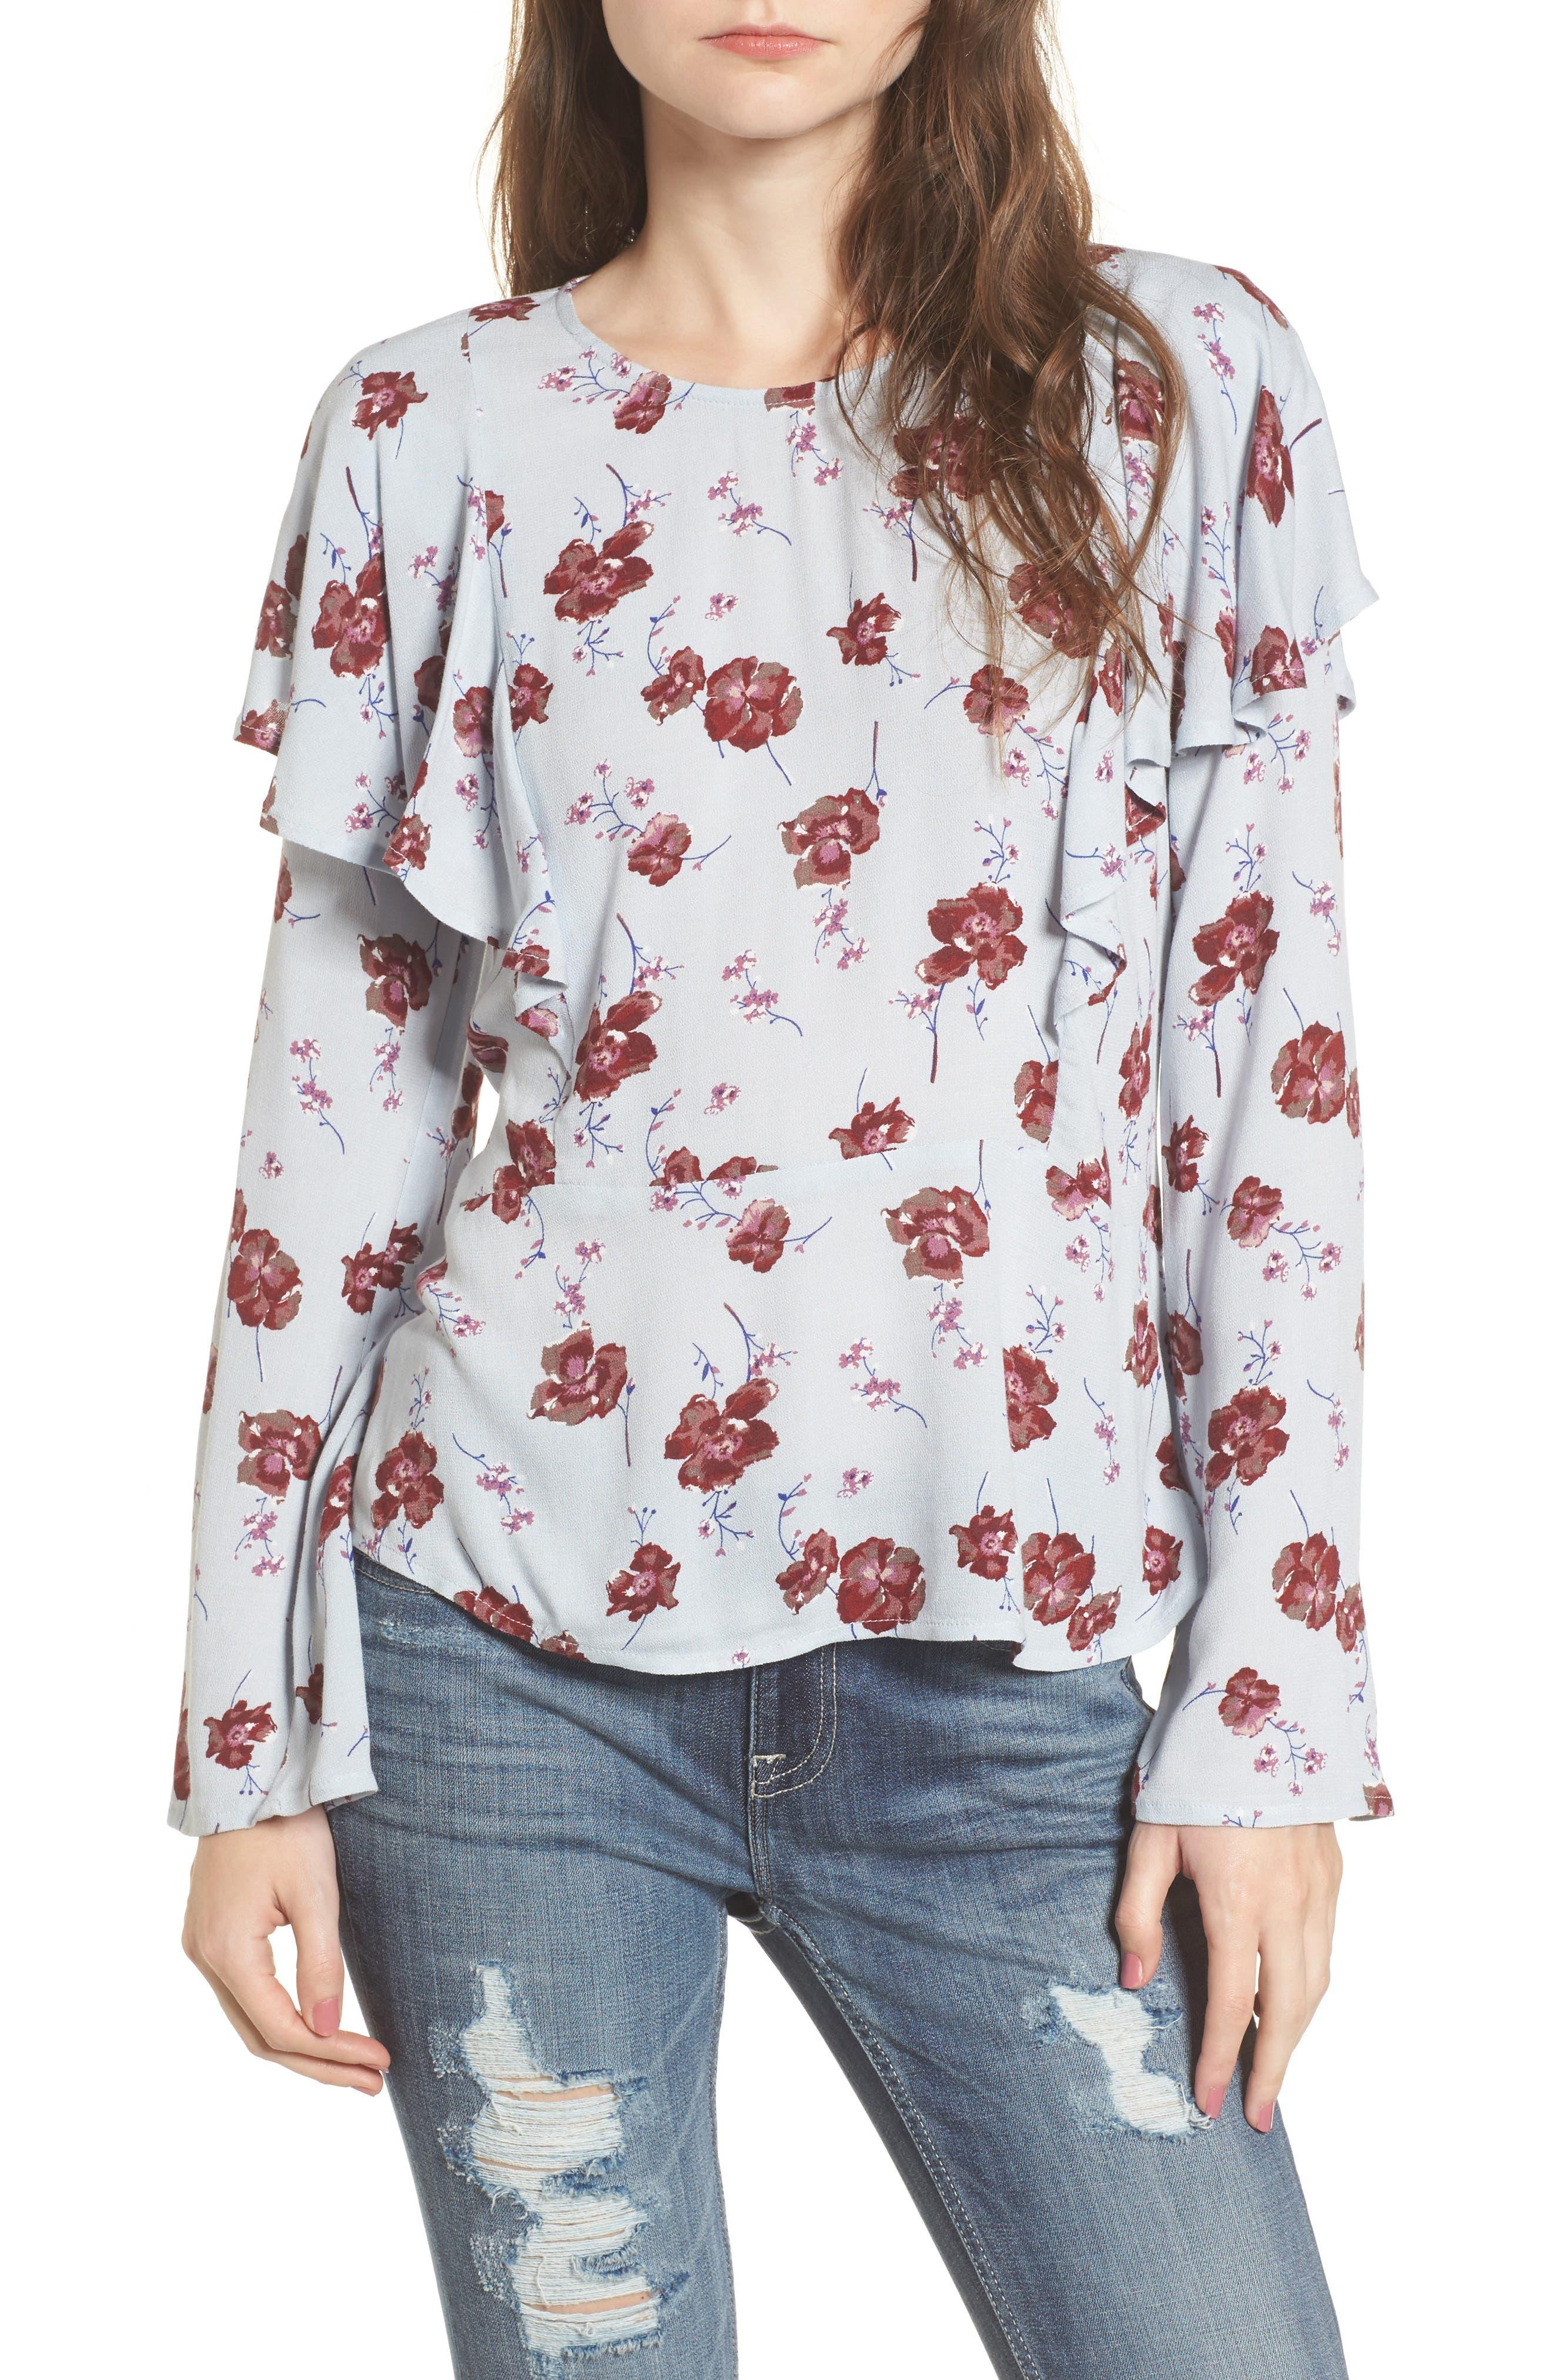 Main Image - BP. Floral Print Ruffle Blouse